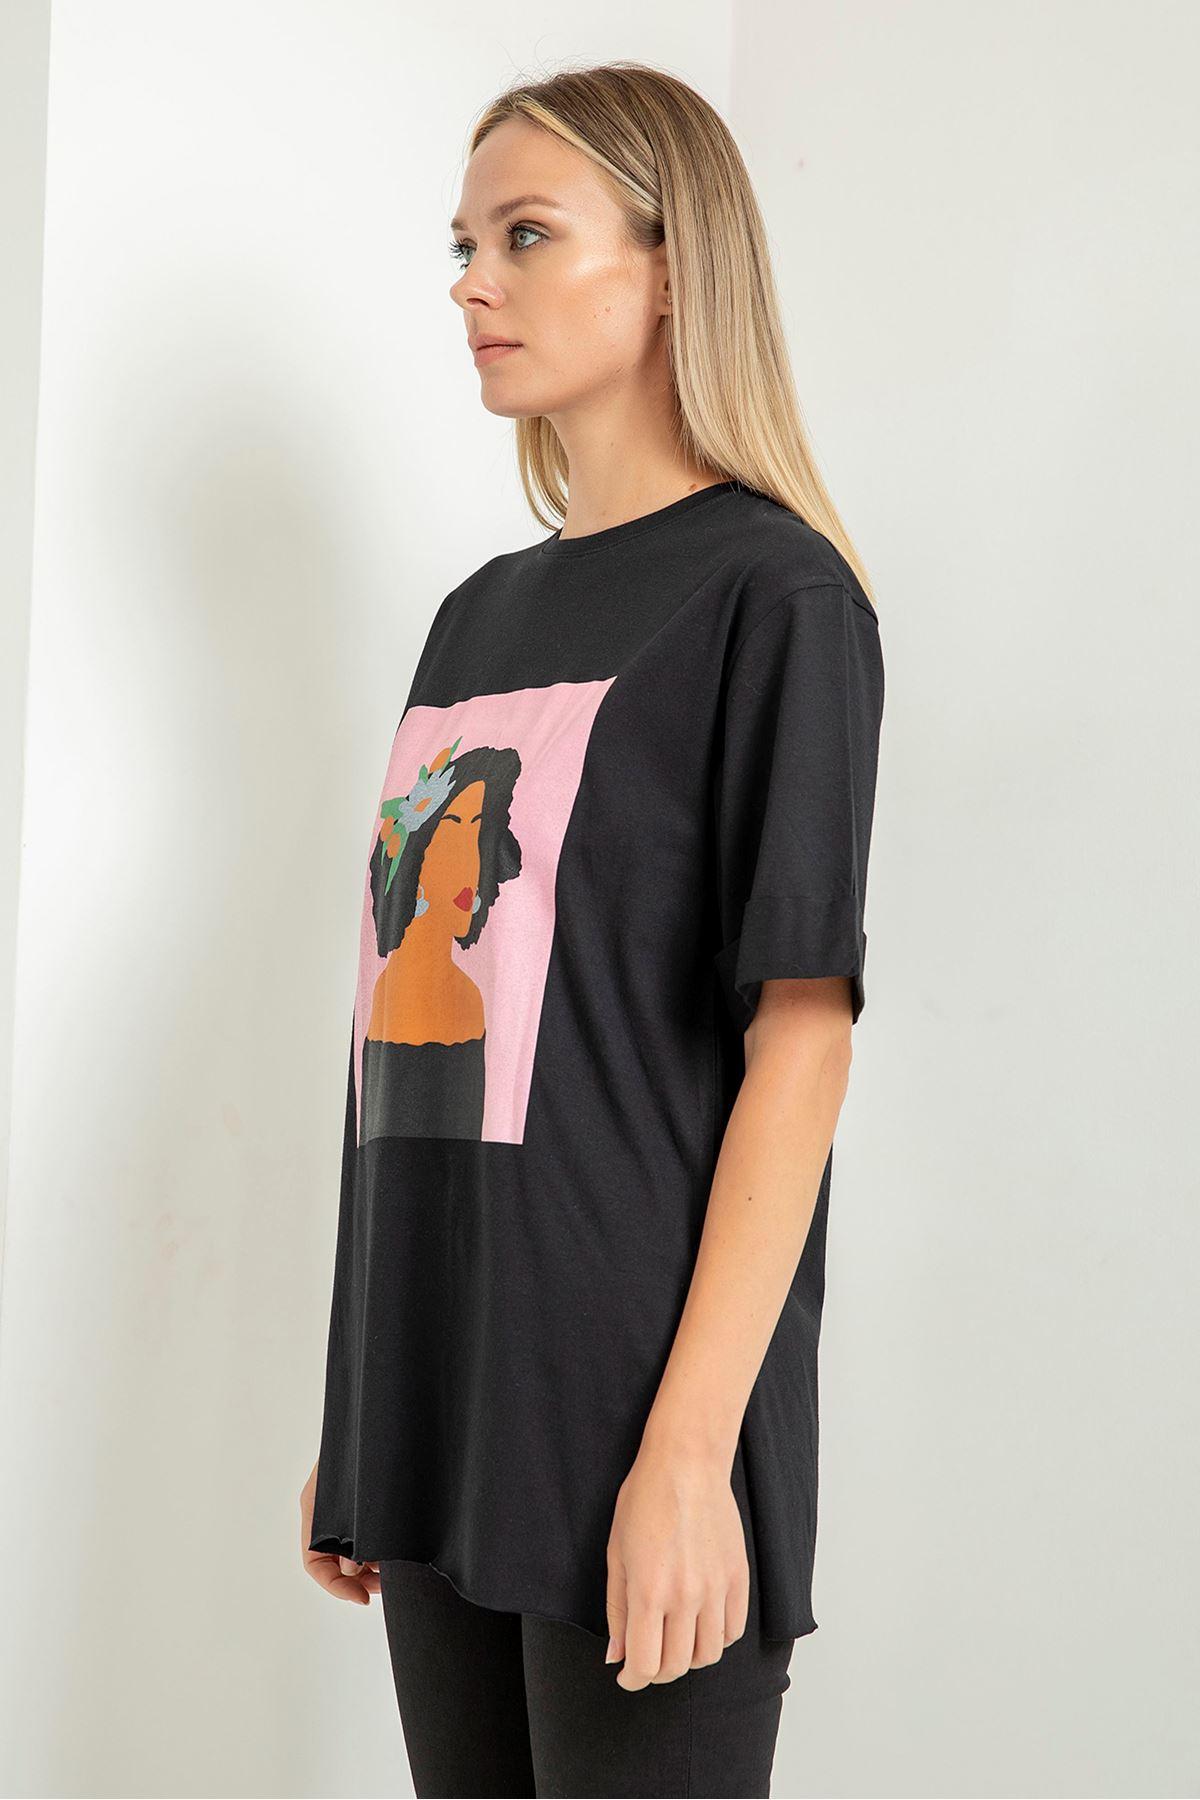 Çiçekli Kız Baskılı T-Shirt-Siyah